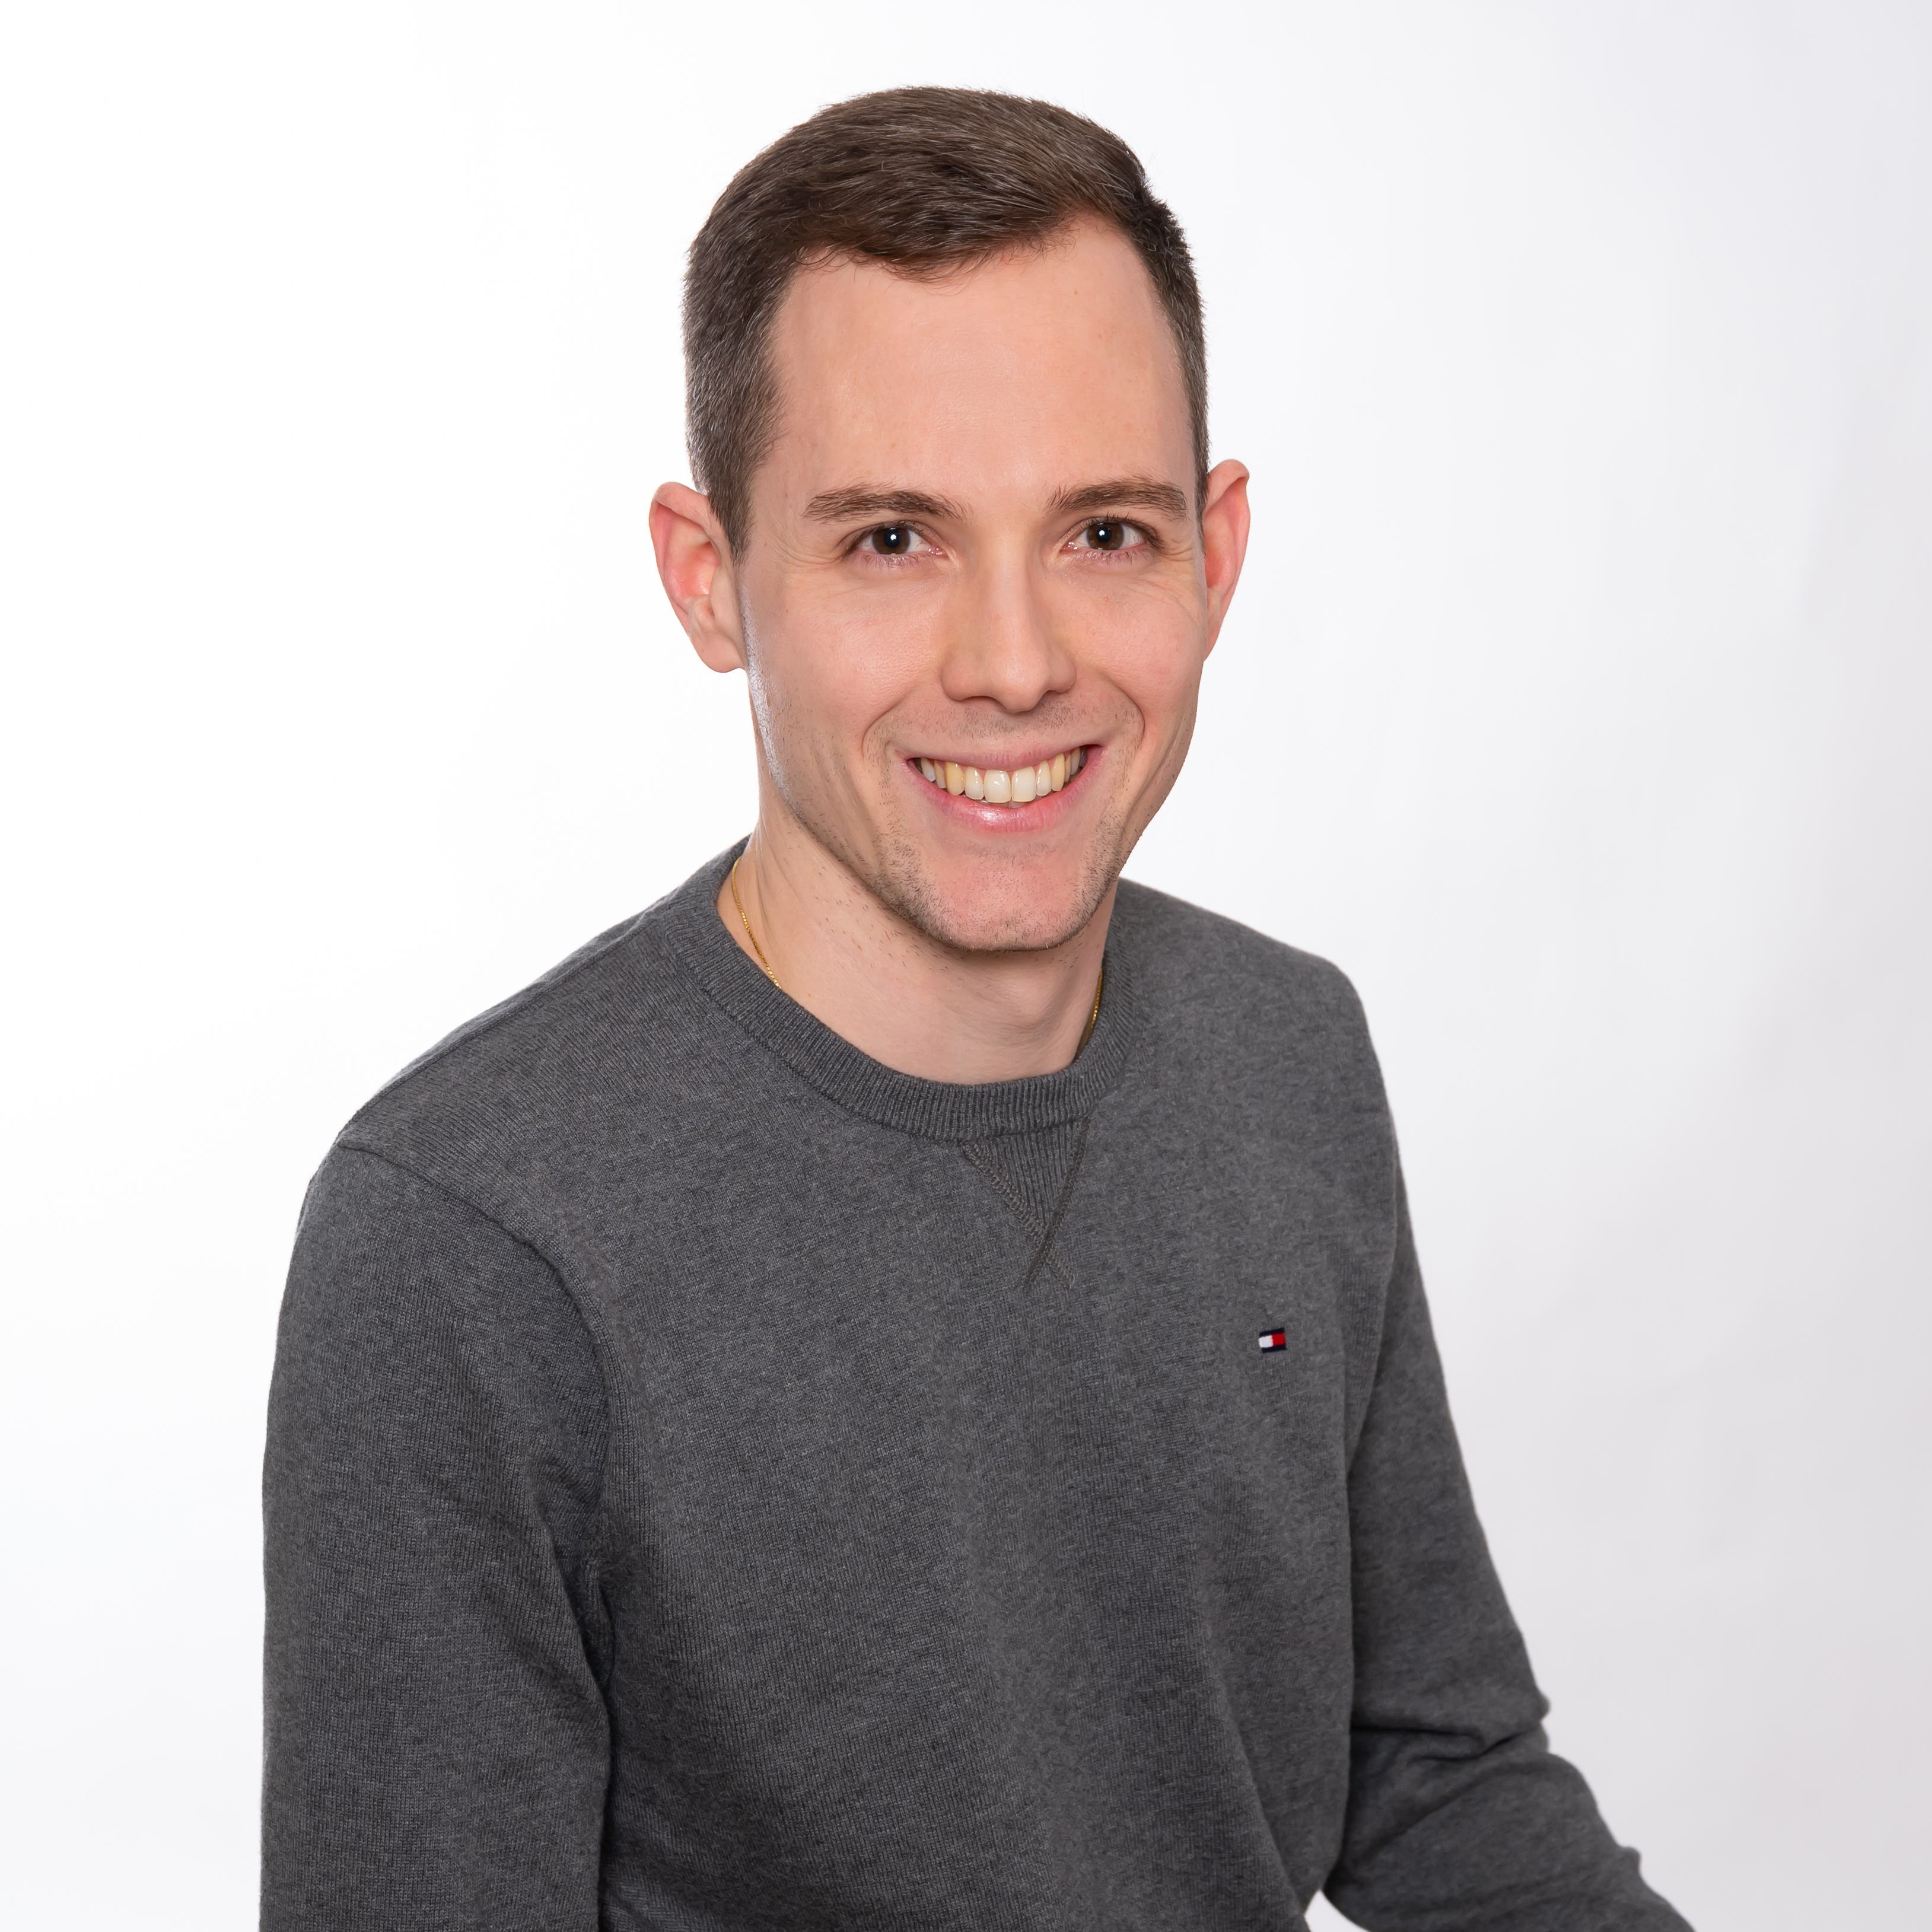 Michael Krummenacher, JCVP